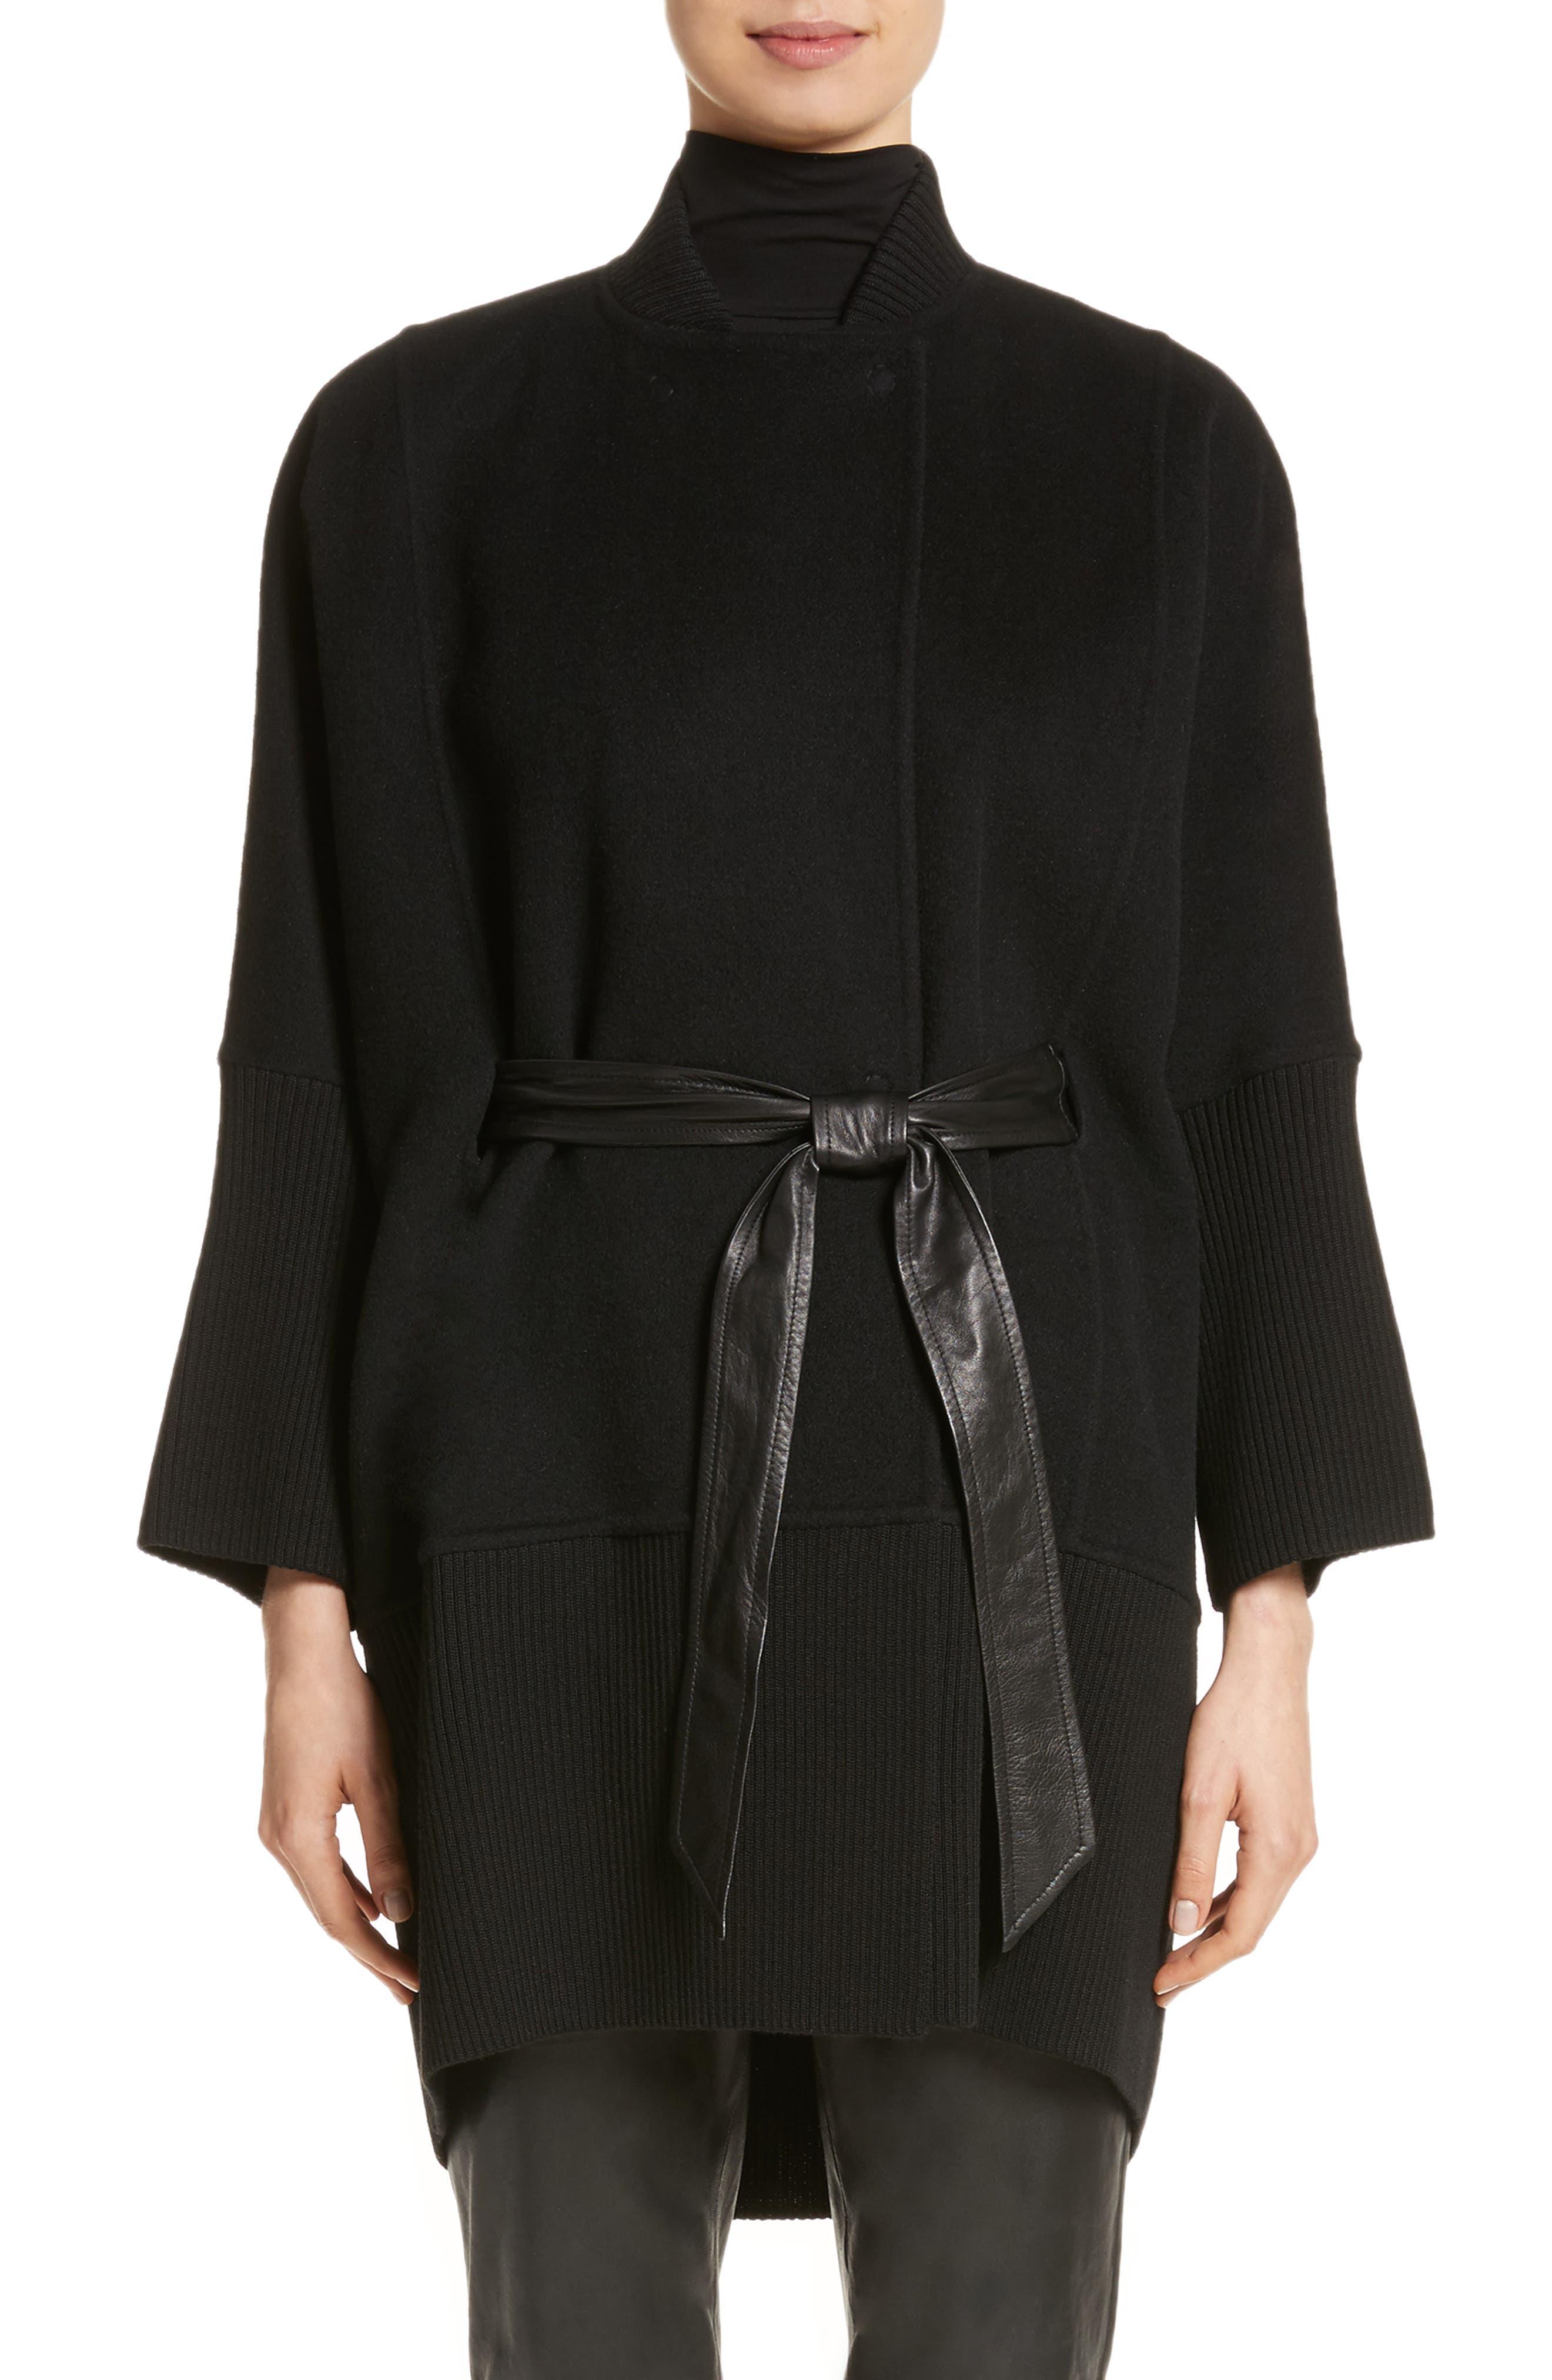 St. John Collection Wool, Angora & Cashmere Blend Jacket